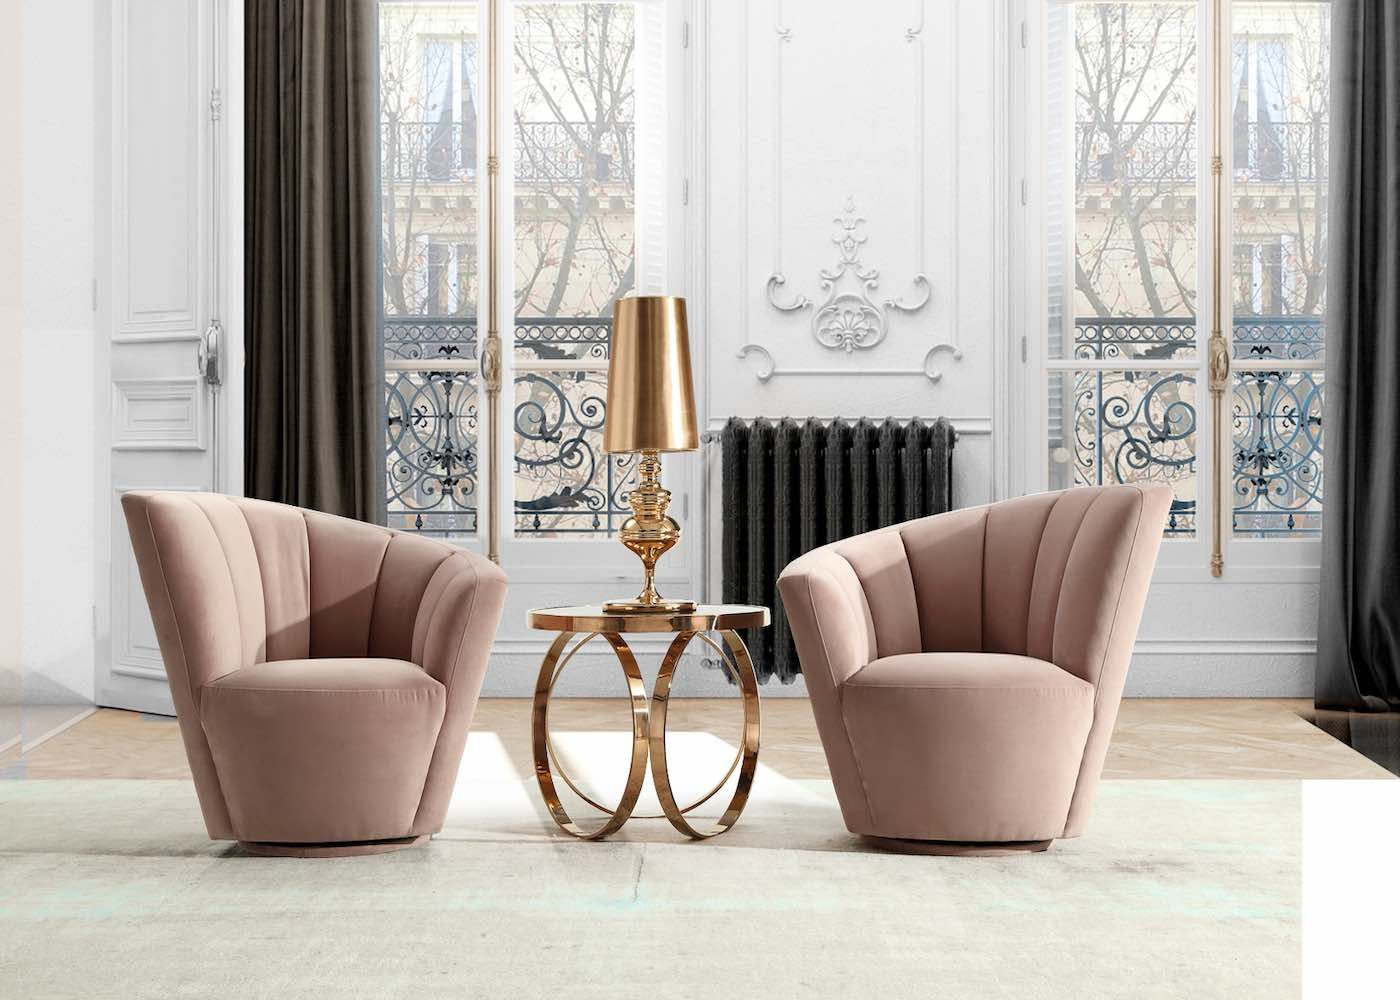 mazarin-ameublement-catalogue-produits-chaise-fauteuil-30